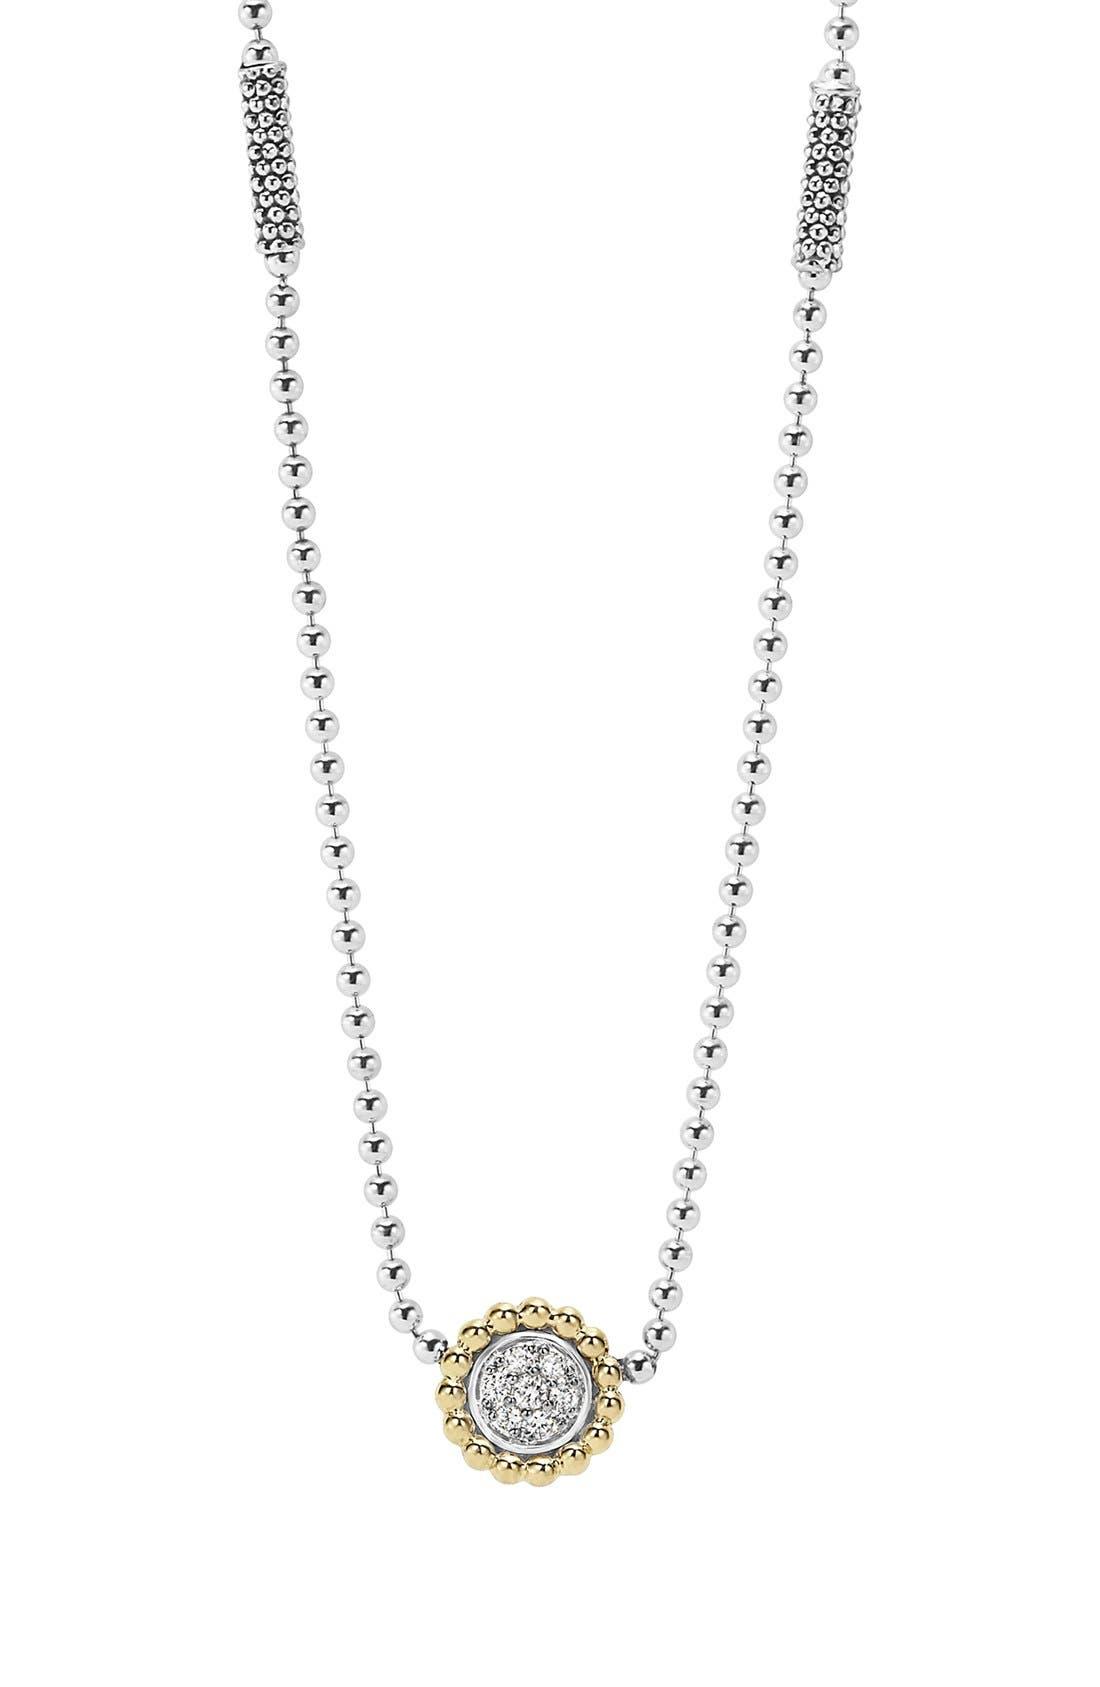 Alternate Image 1 Selected - LAGOS 'Caviar' Circle Pendant Necklace